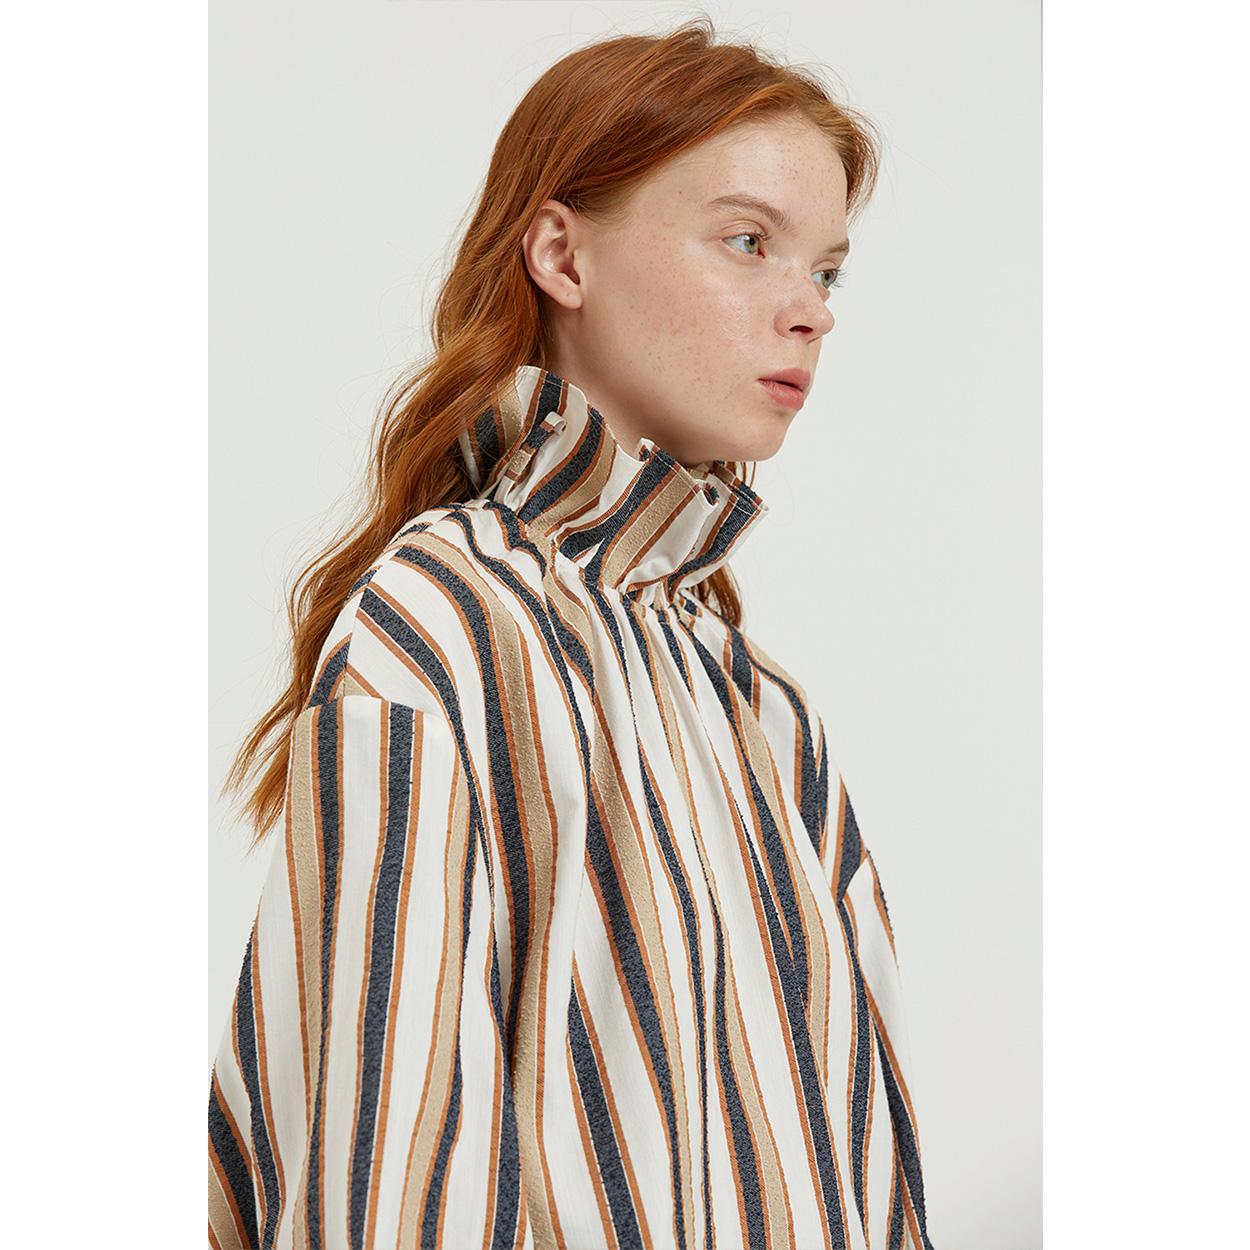 FUSSED 17AW原创独立设计师品牌 彩色条纹宫廷式缩褶高领露背上衣